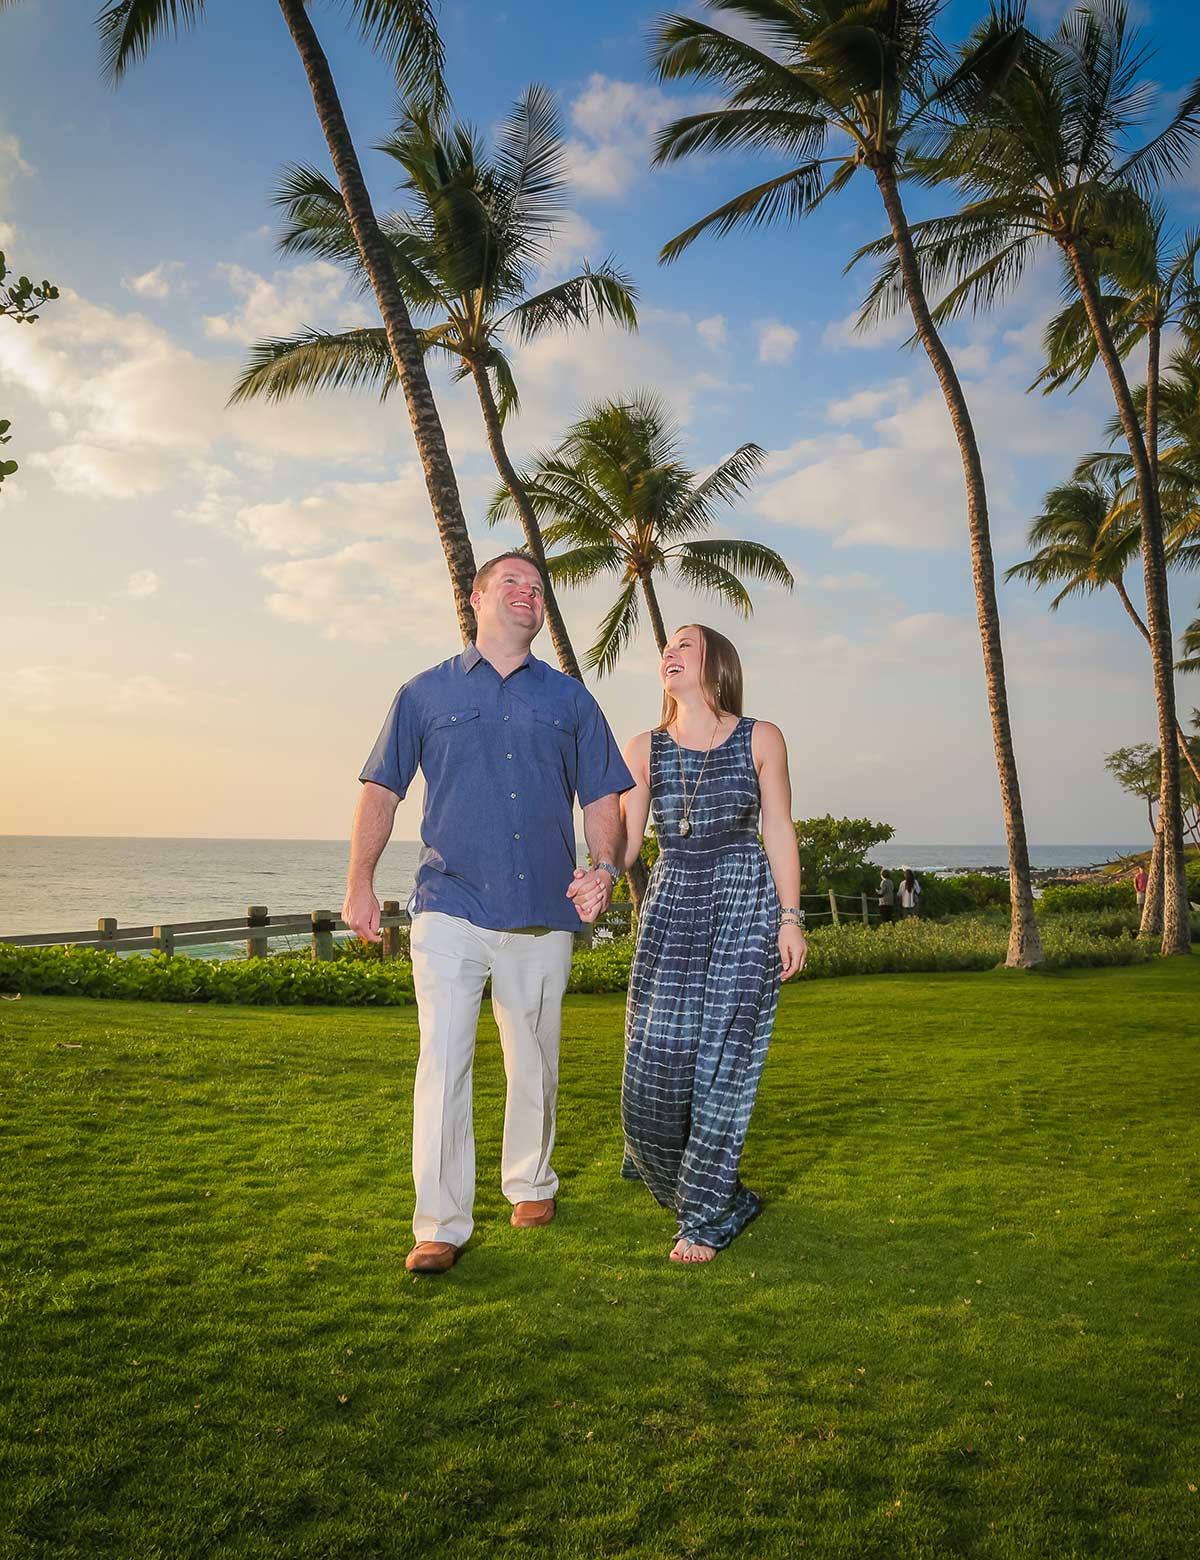 Candid Couple Photographer Maui